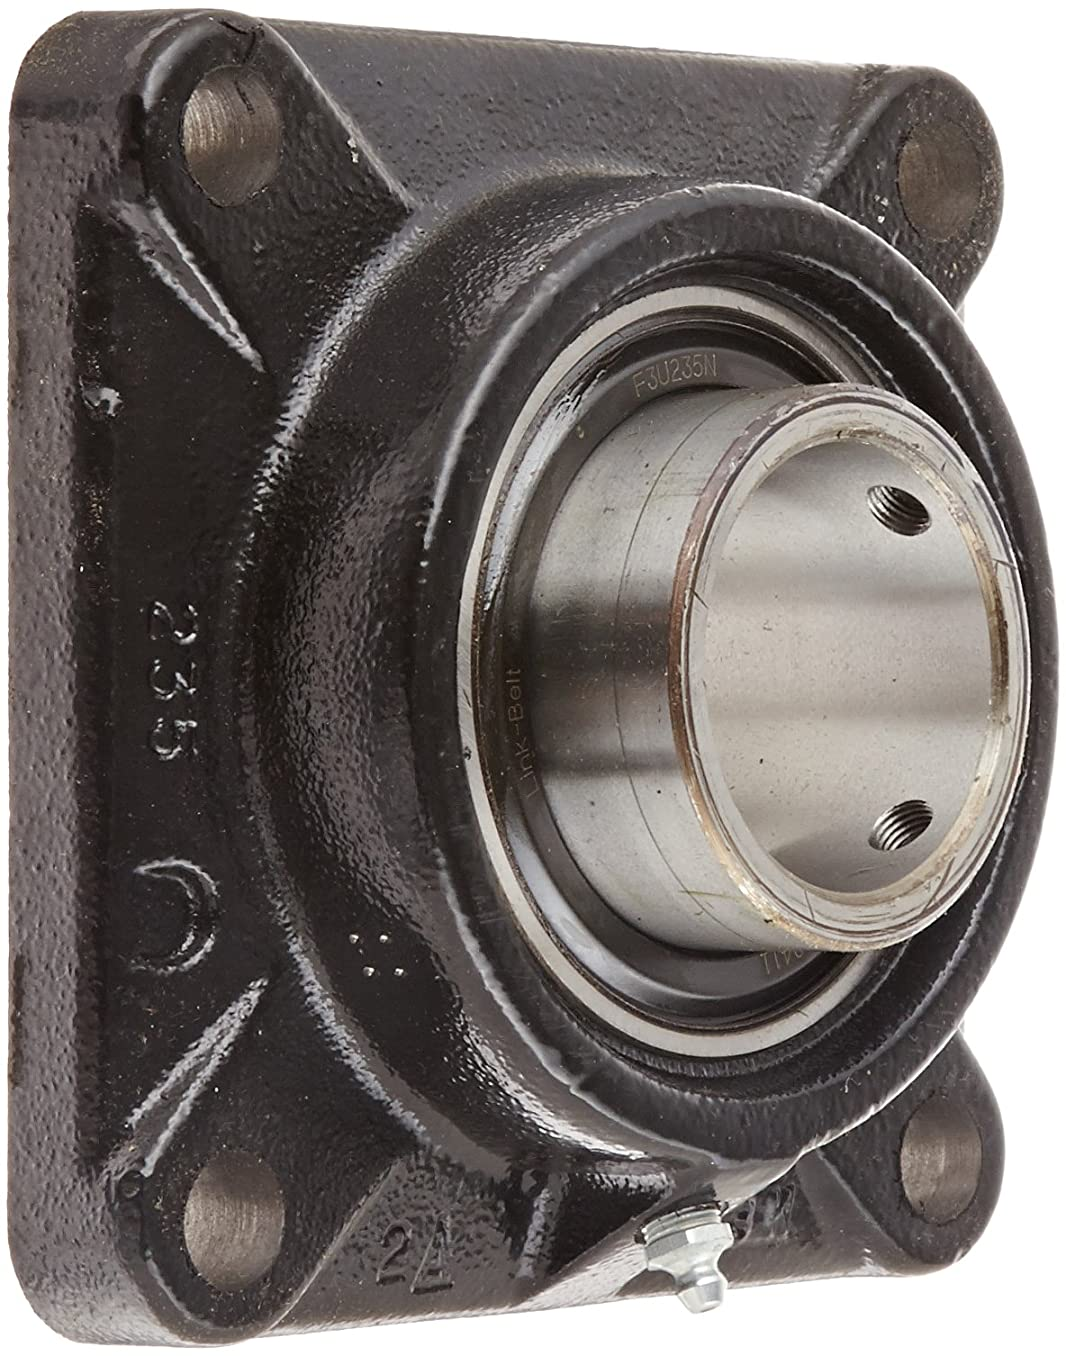 Link-Belt F3U235N Ball Bearing Flange Unit, 4 Bolt Holes, Standard-Duty, Relubricatable, Non-Expansion, Cast Iron, Spring Locking Collar, Inch, 2-3/16